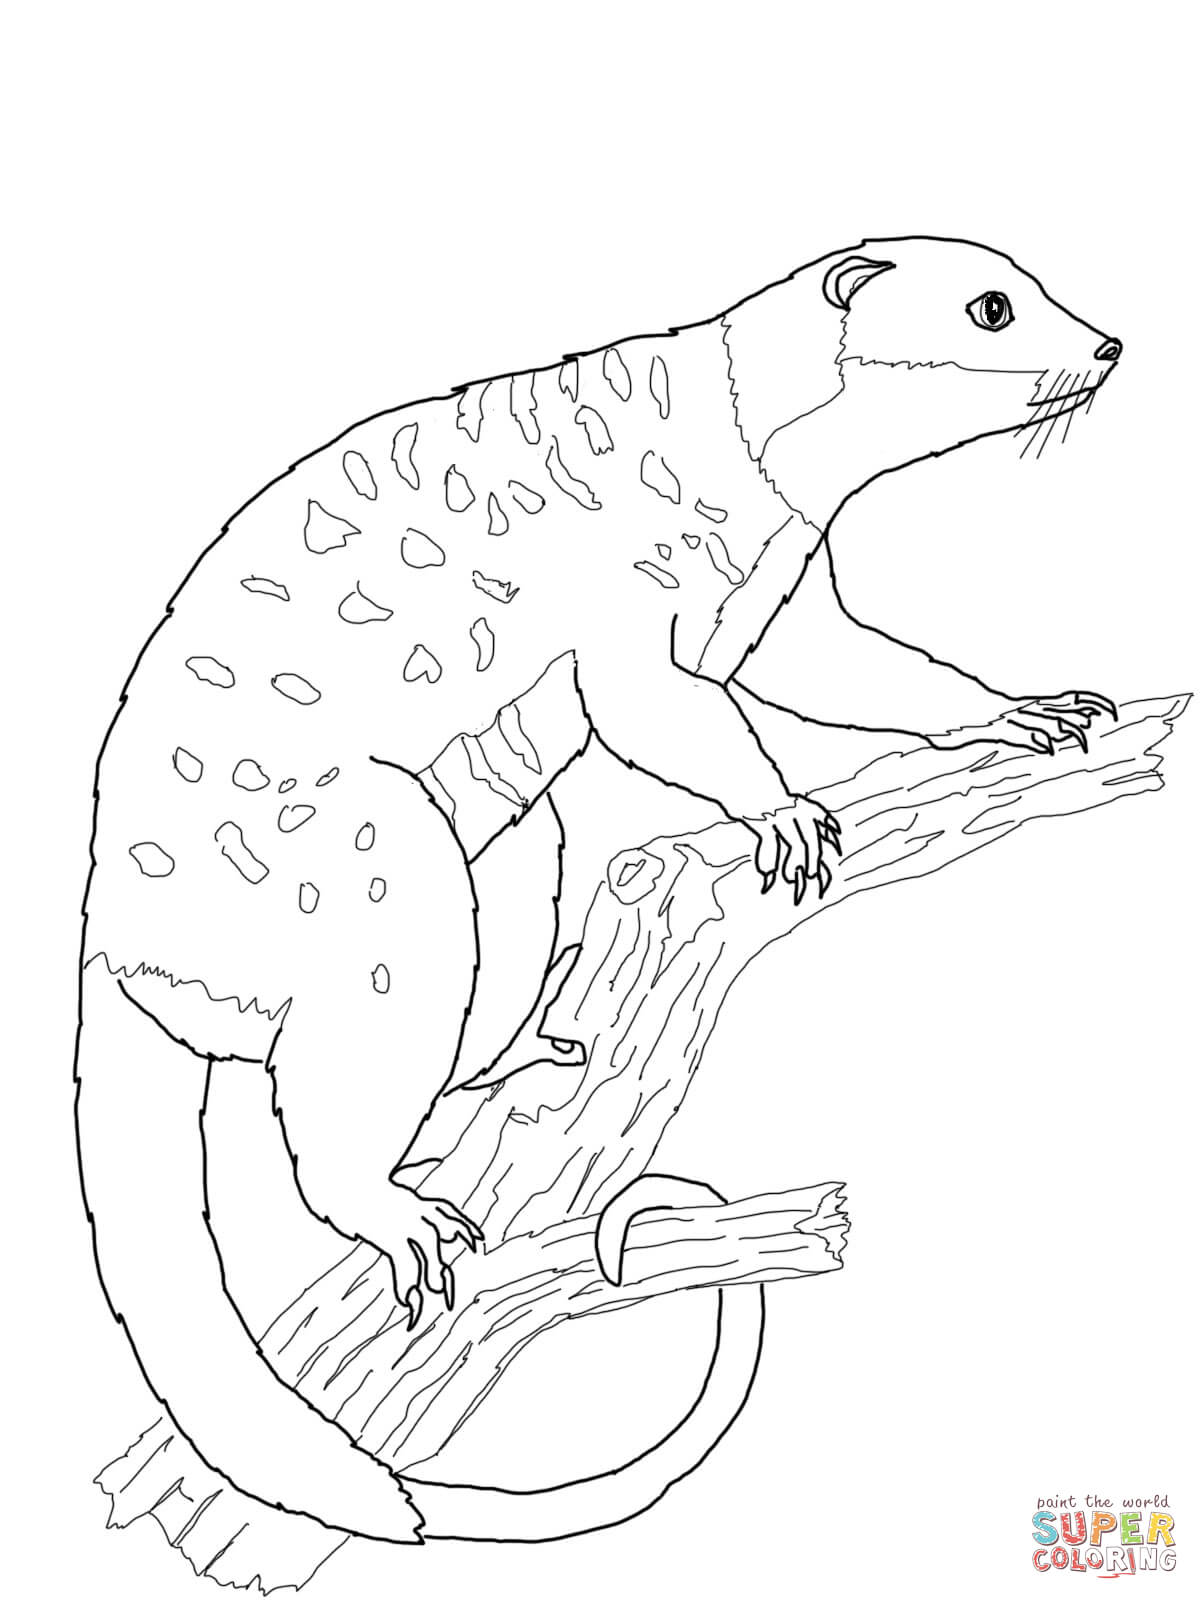 Cuscus coloring #9, Download drawings